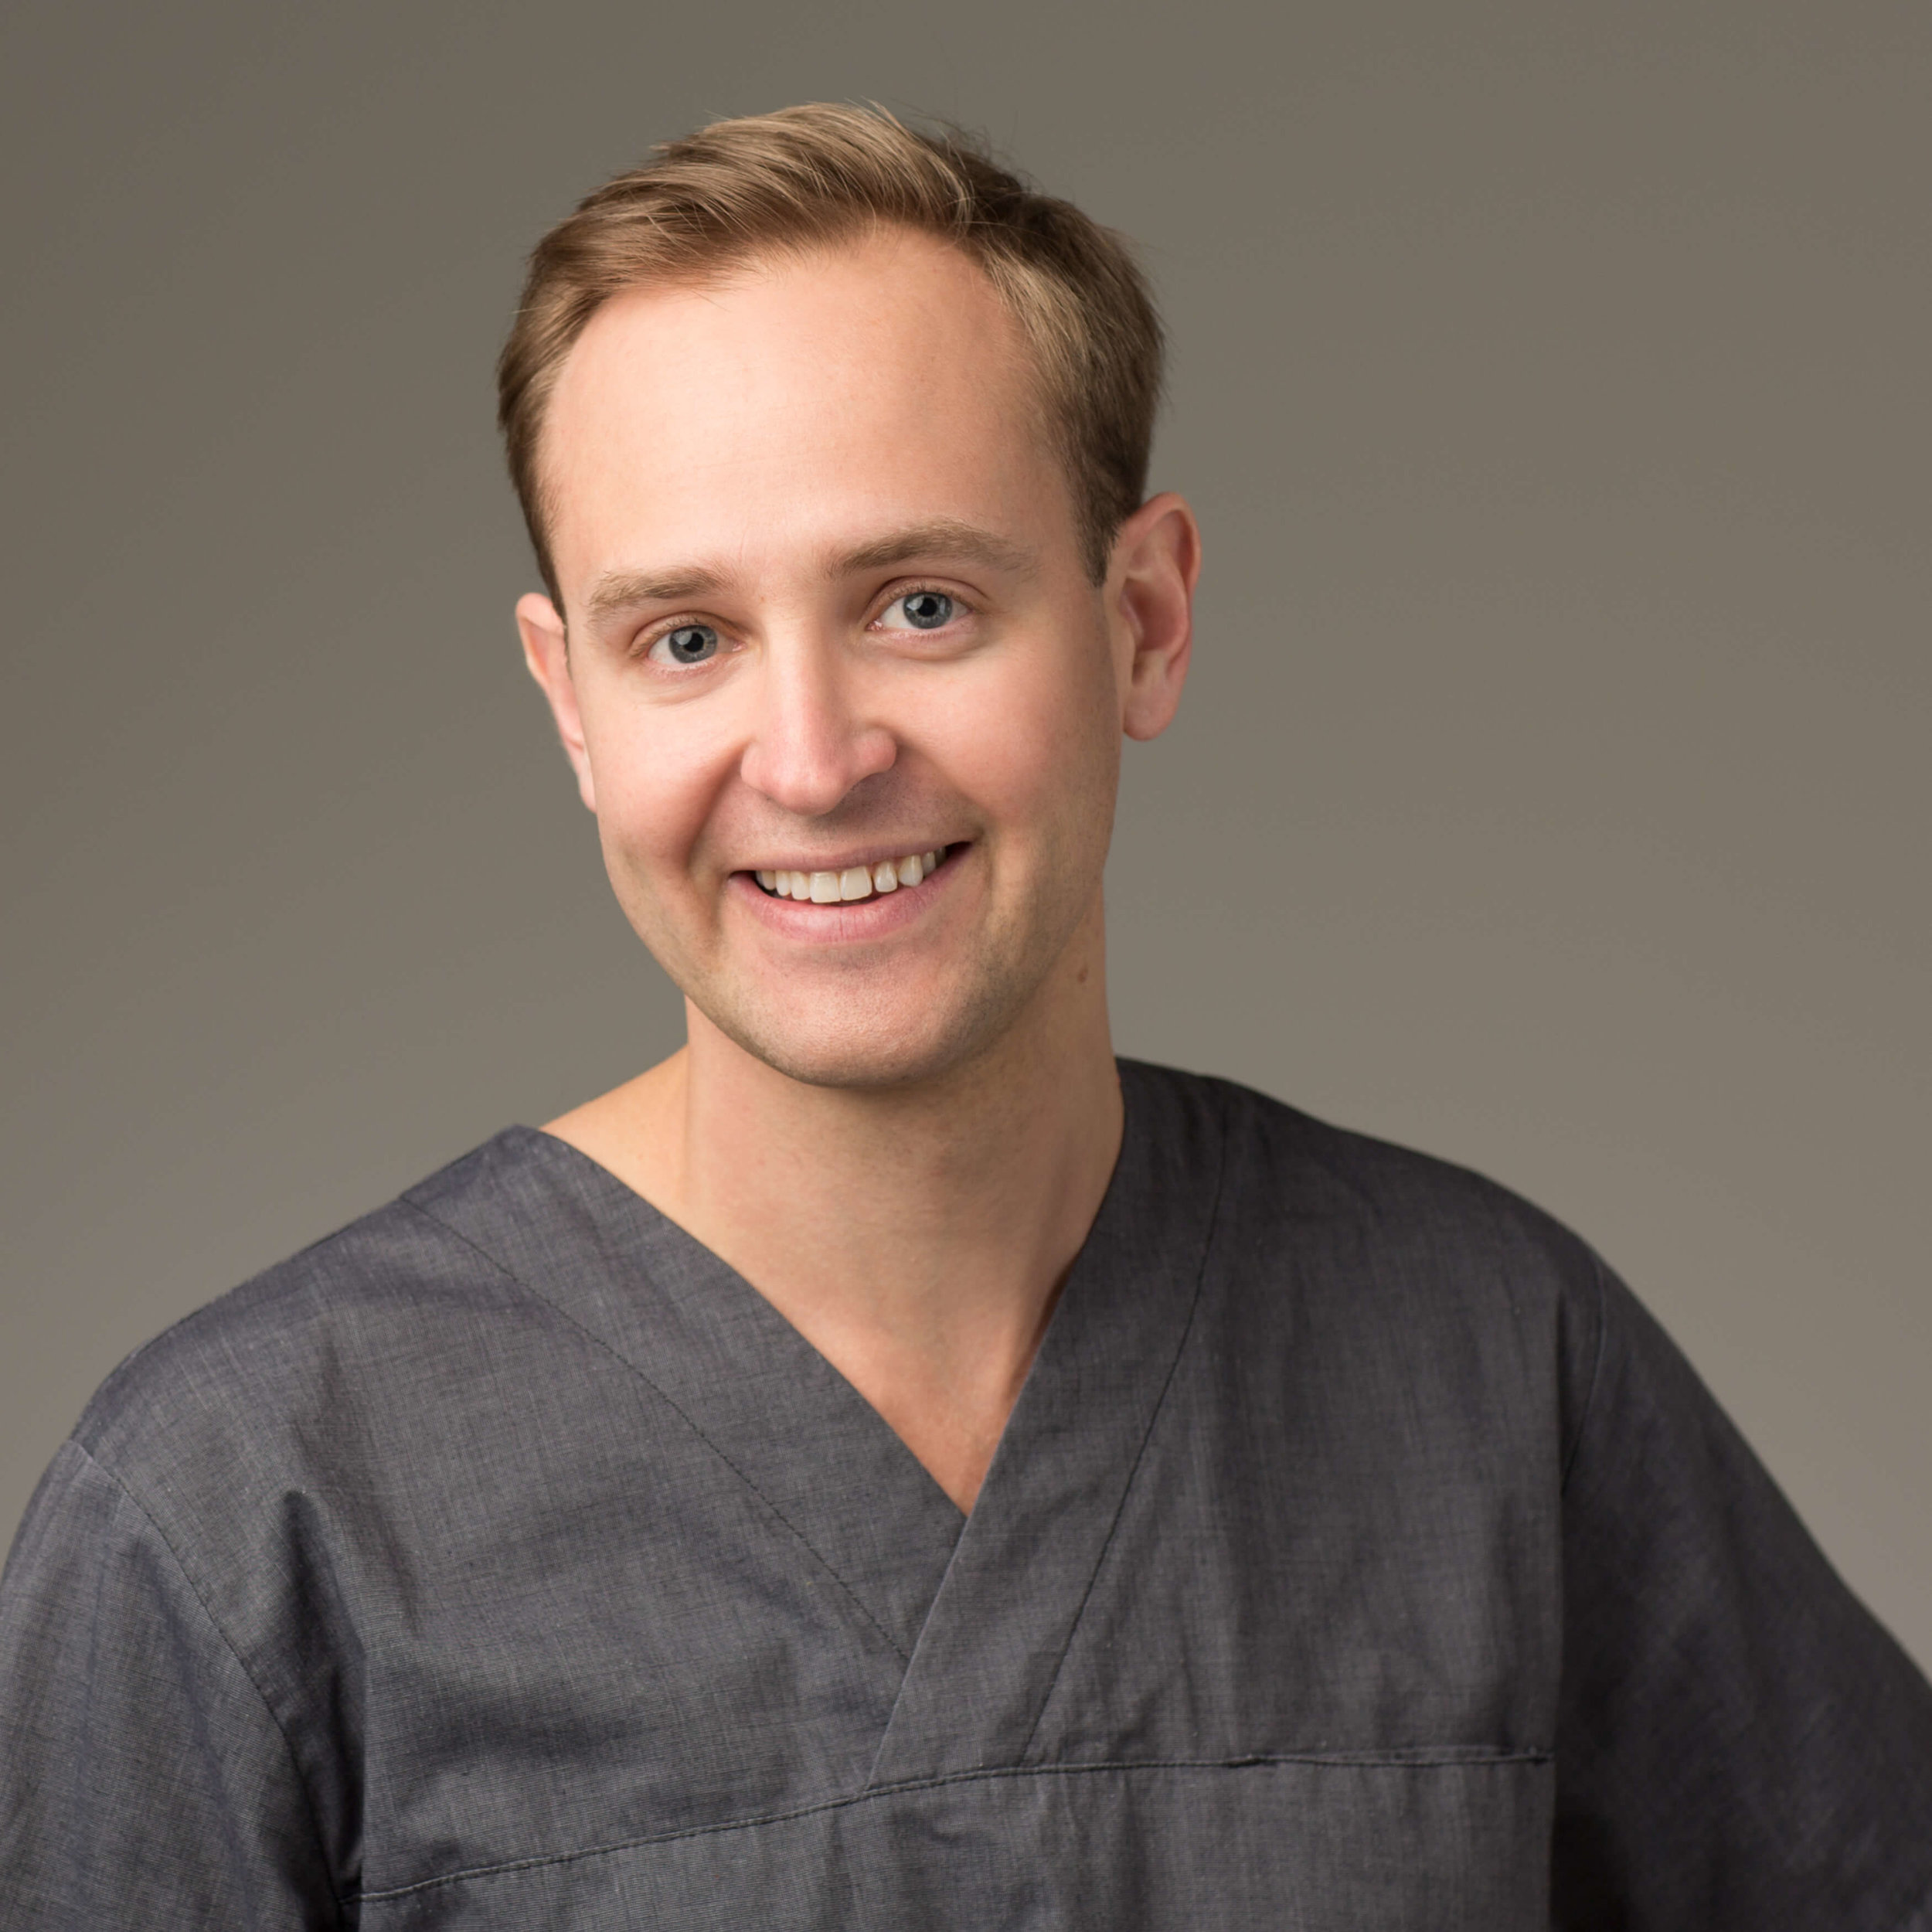 Tandläkare Marcus Ambré